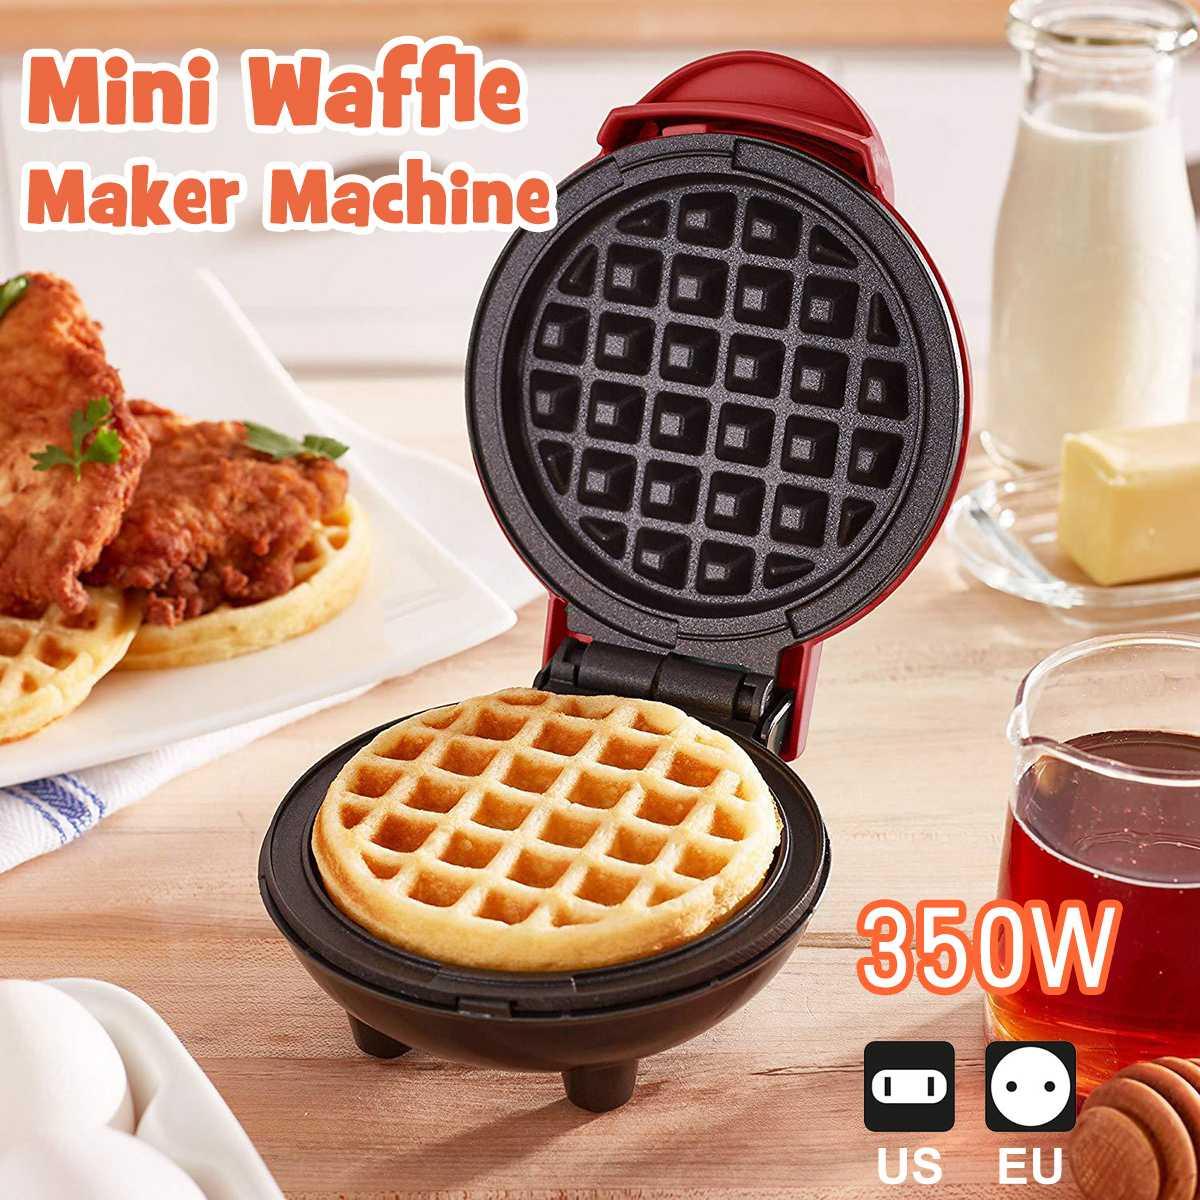 US/EU plug Mini Electric Waffles Maker Waffle Egg Cake Pancake Non-stick Baking Pan one person Breakfast Machine Muffin Sandwich